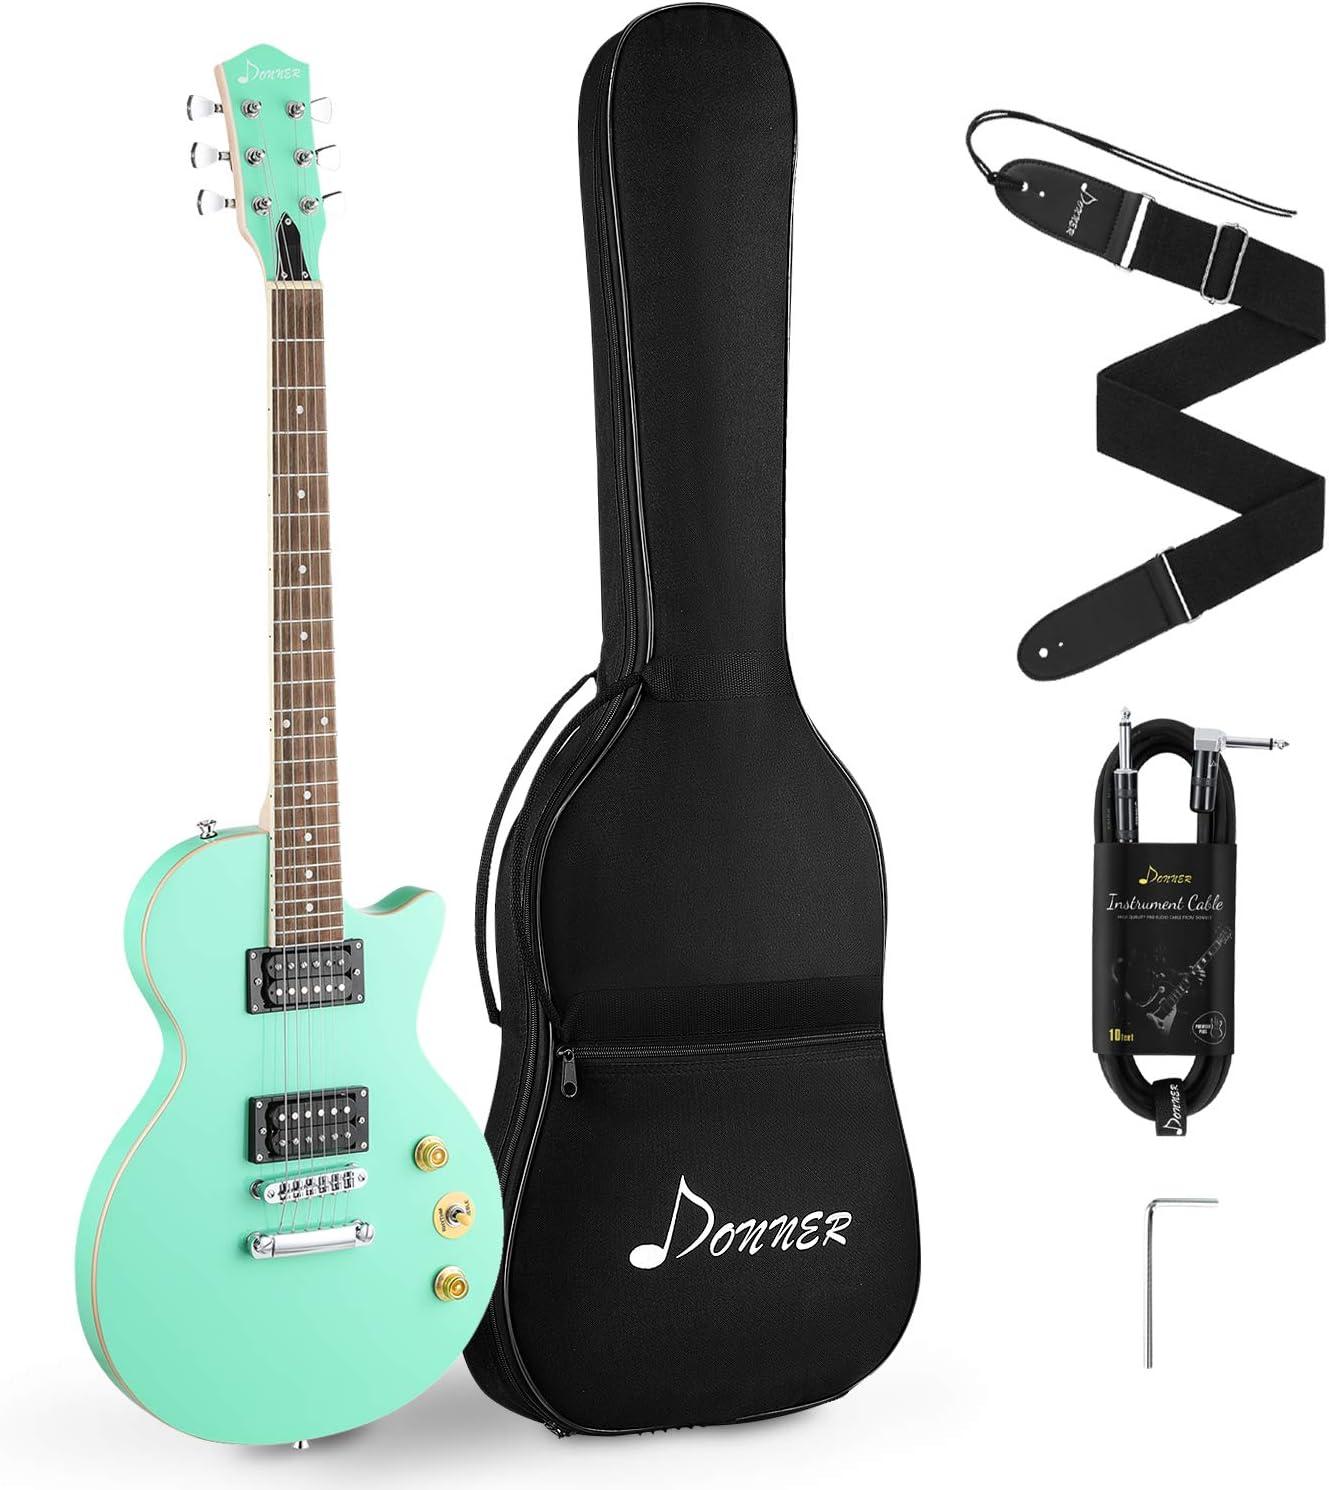 Donner DLP-124G Guitarra eléctrica con bolsa, correa, cable, Verde